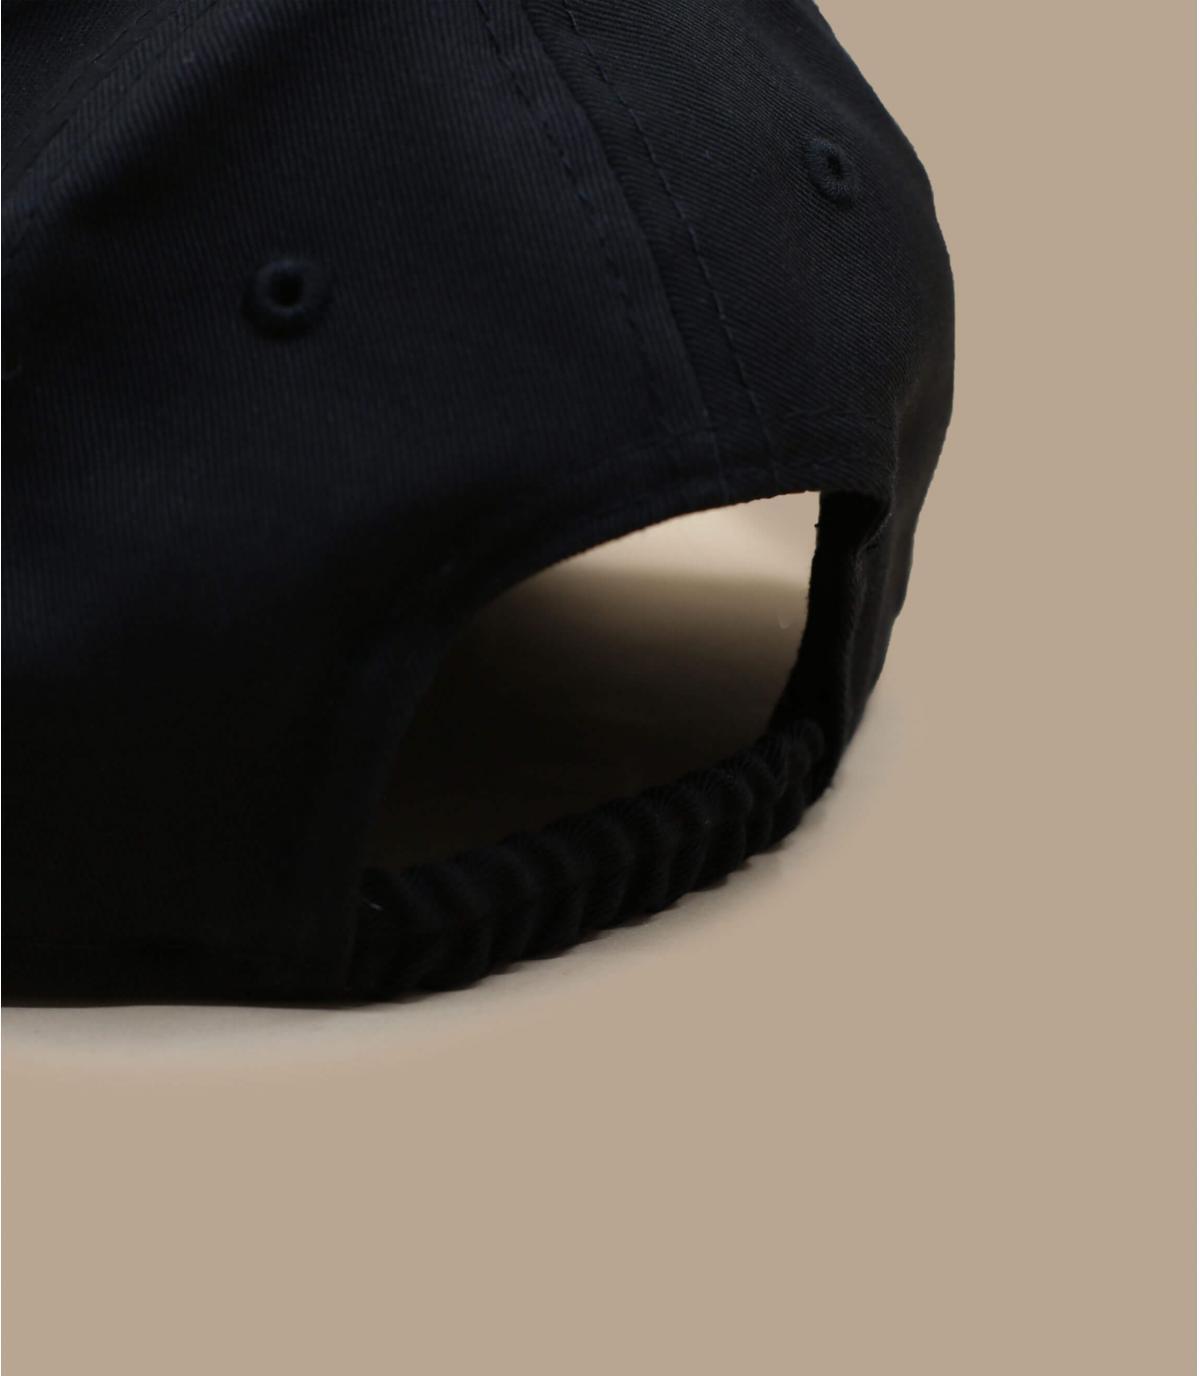 Details Baby Cap NY 9Forty black white - Abbildung 3